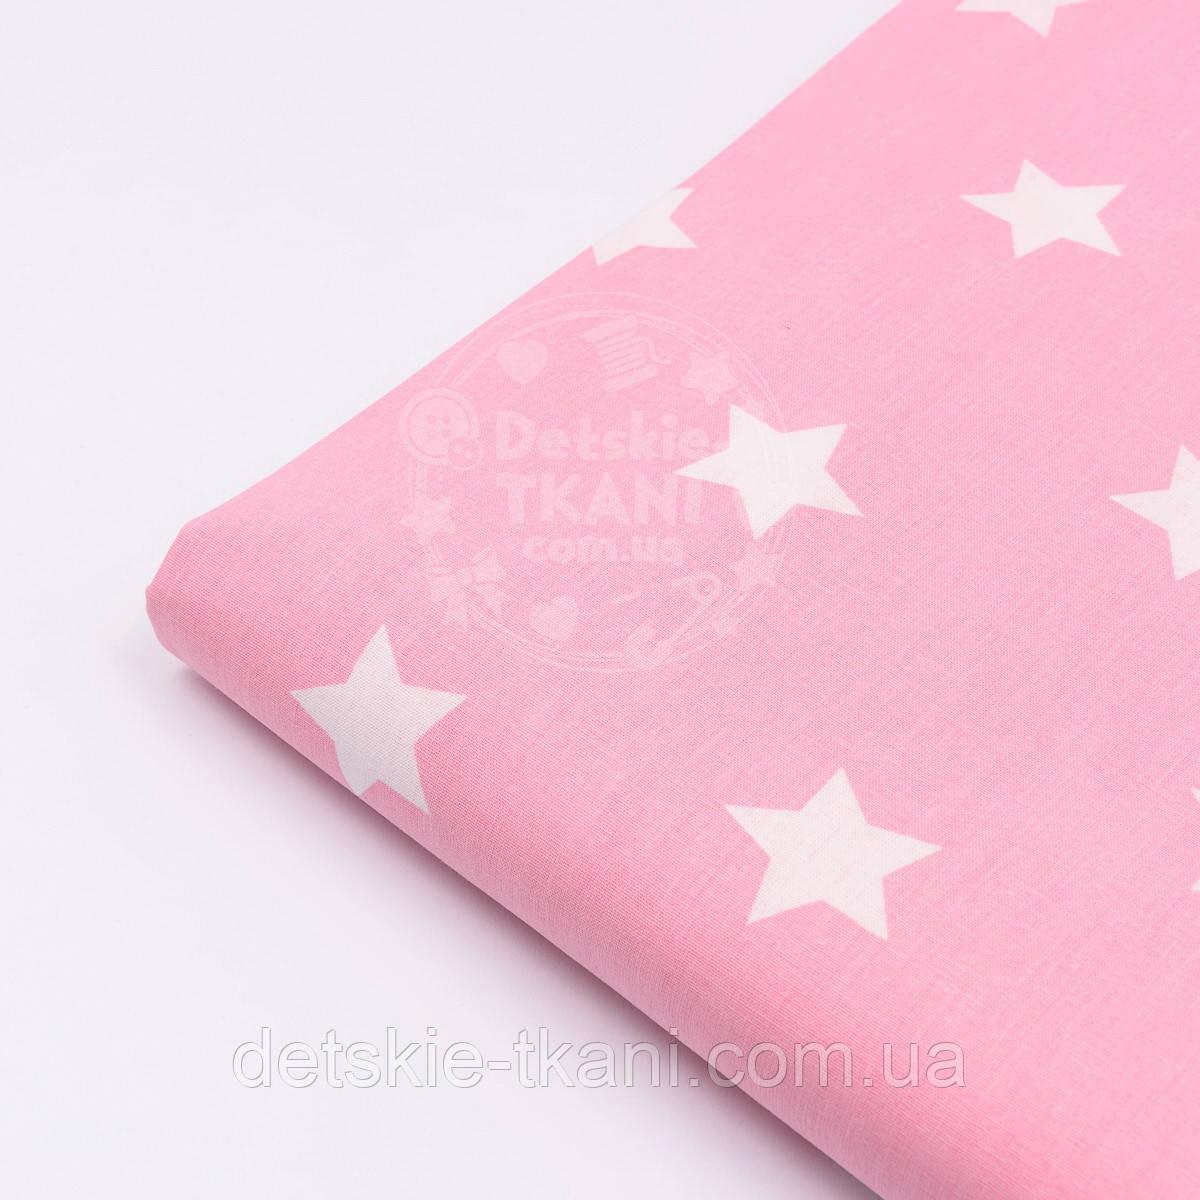 Лоскут ткани ранфорс с белыми звёздами 3 см на розовом фоне, №1110, размер 68*90 см